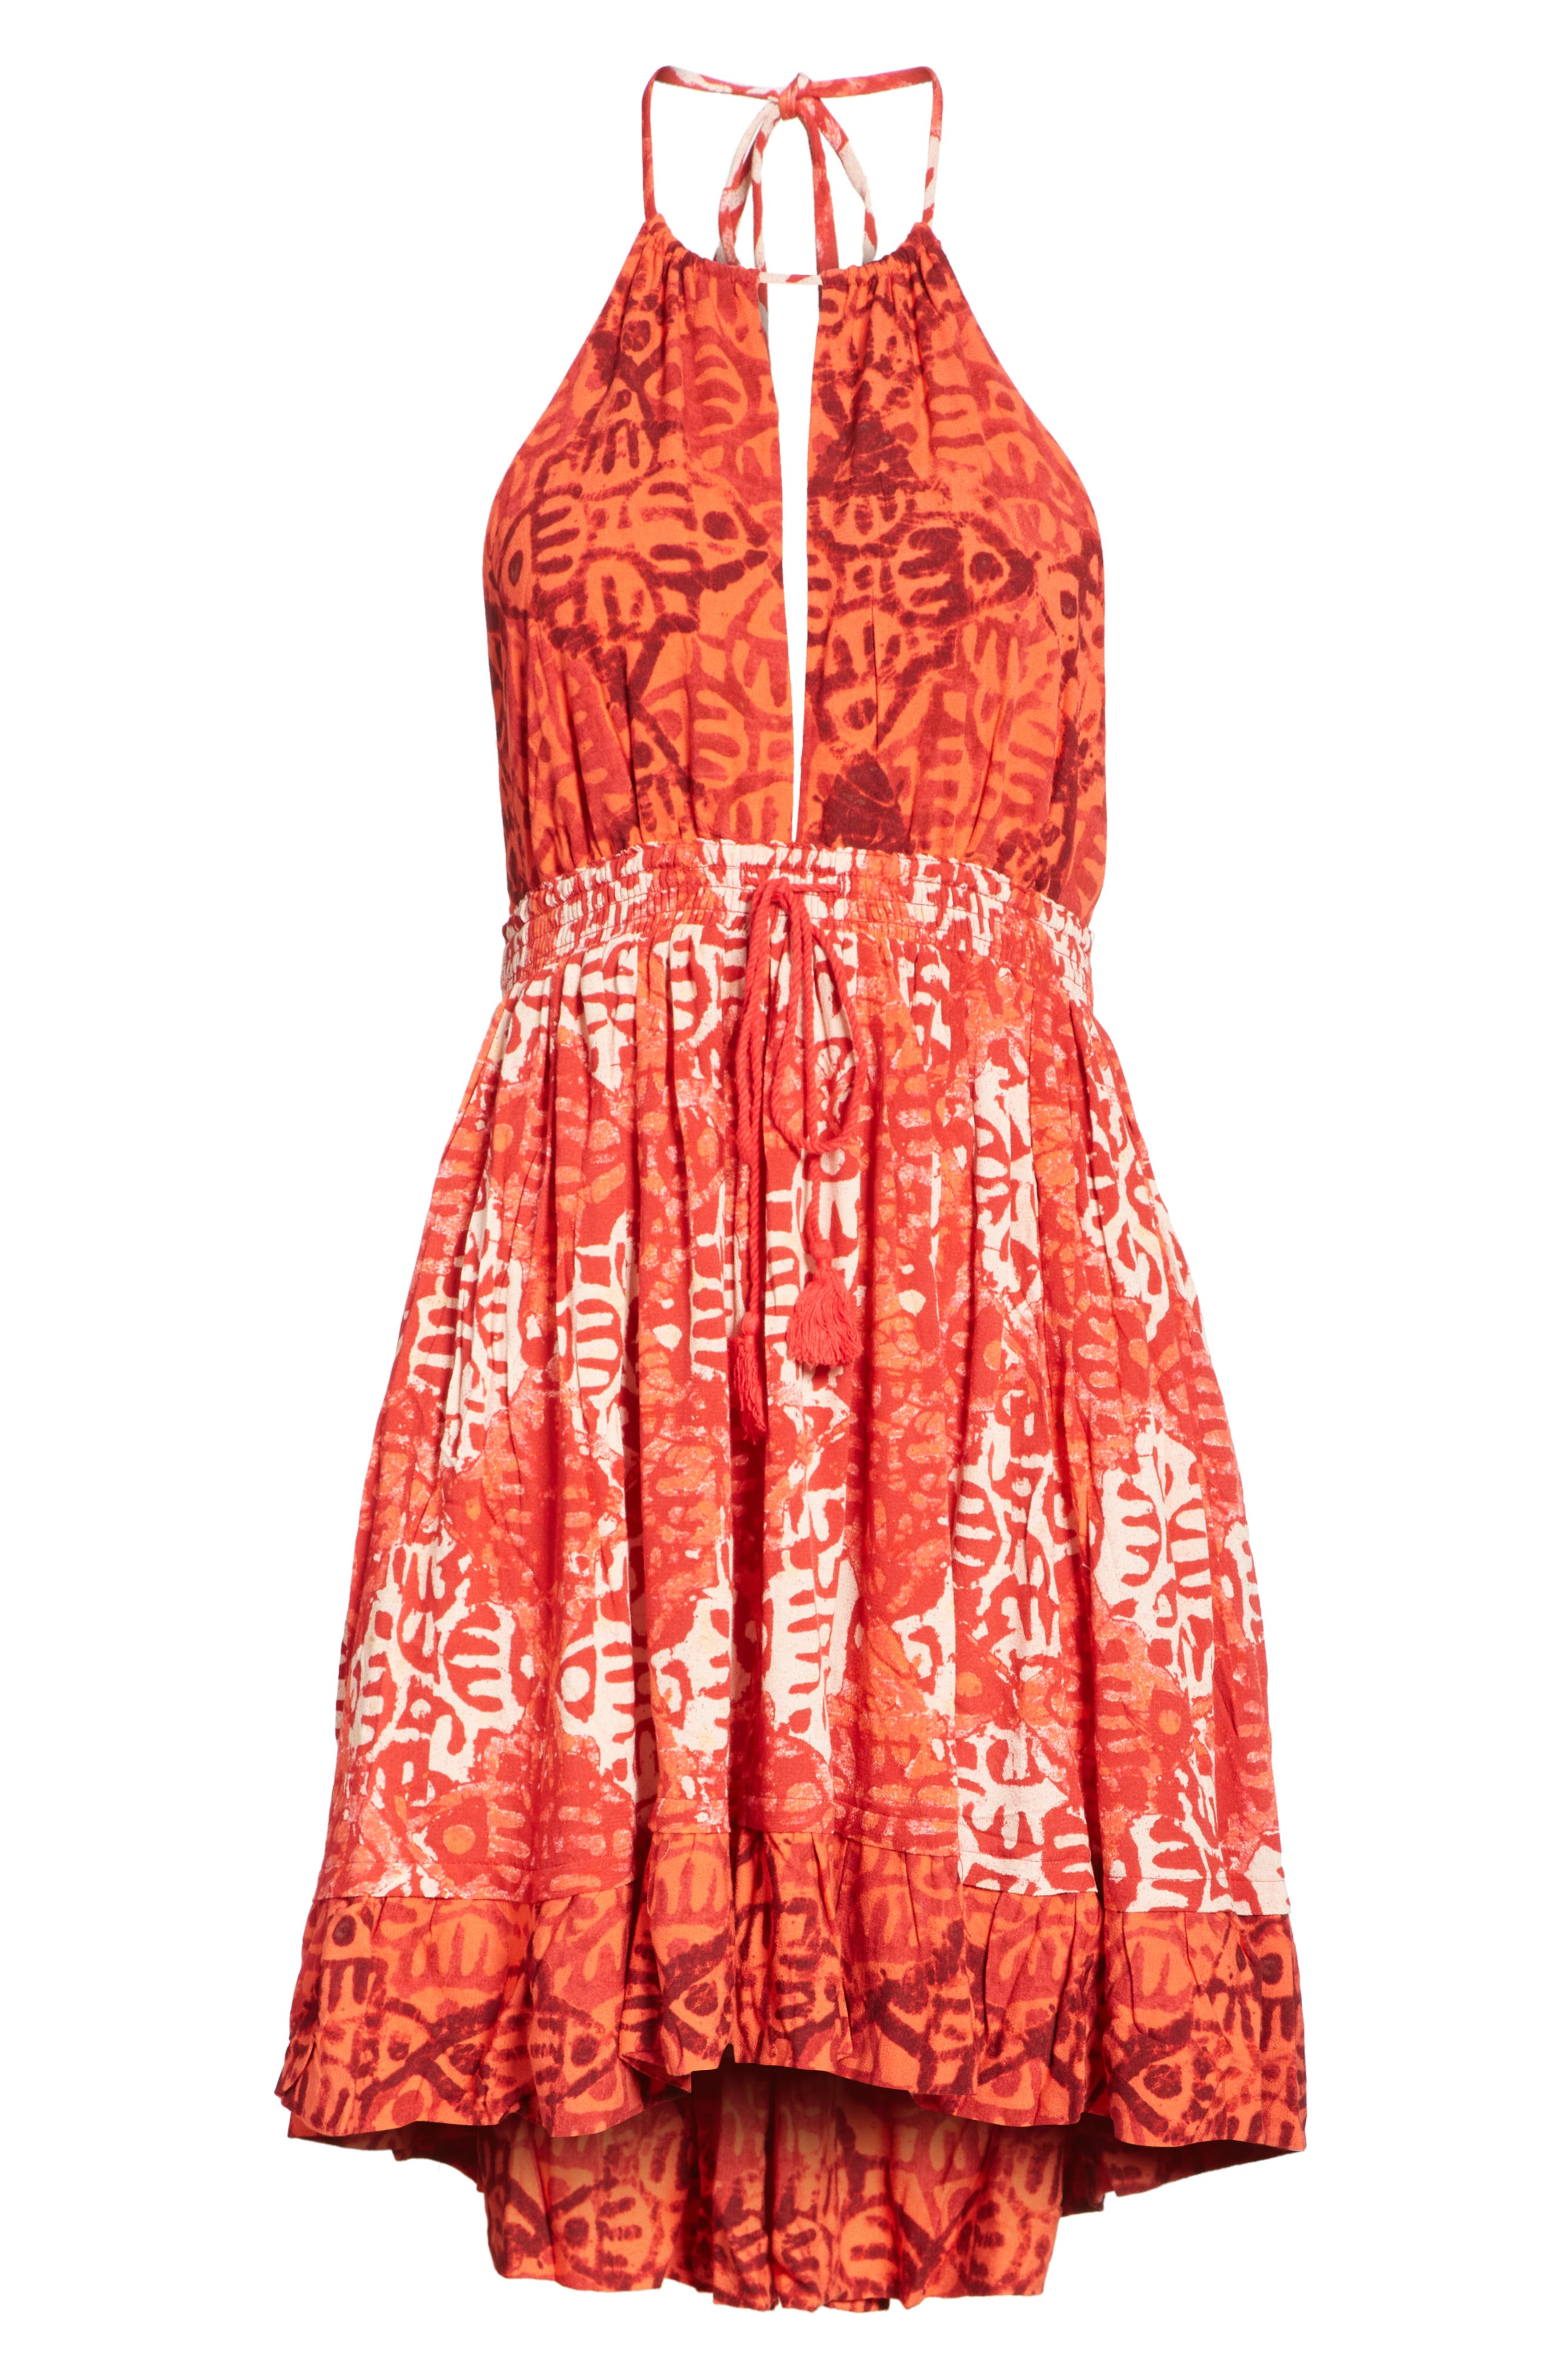 Beach Day Minidress,                             Alternate thumbnail 6, color,                             Red